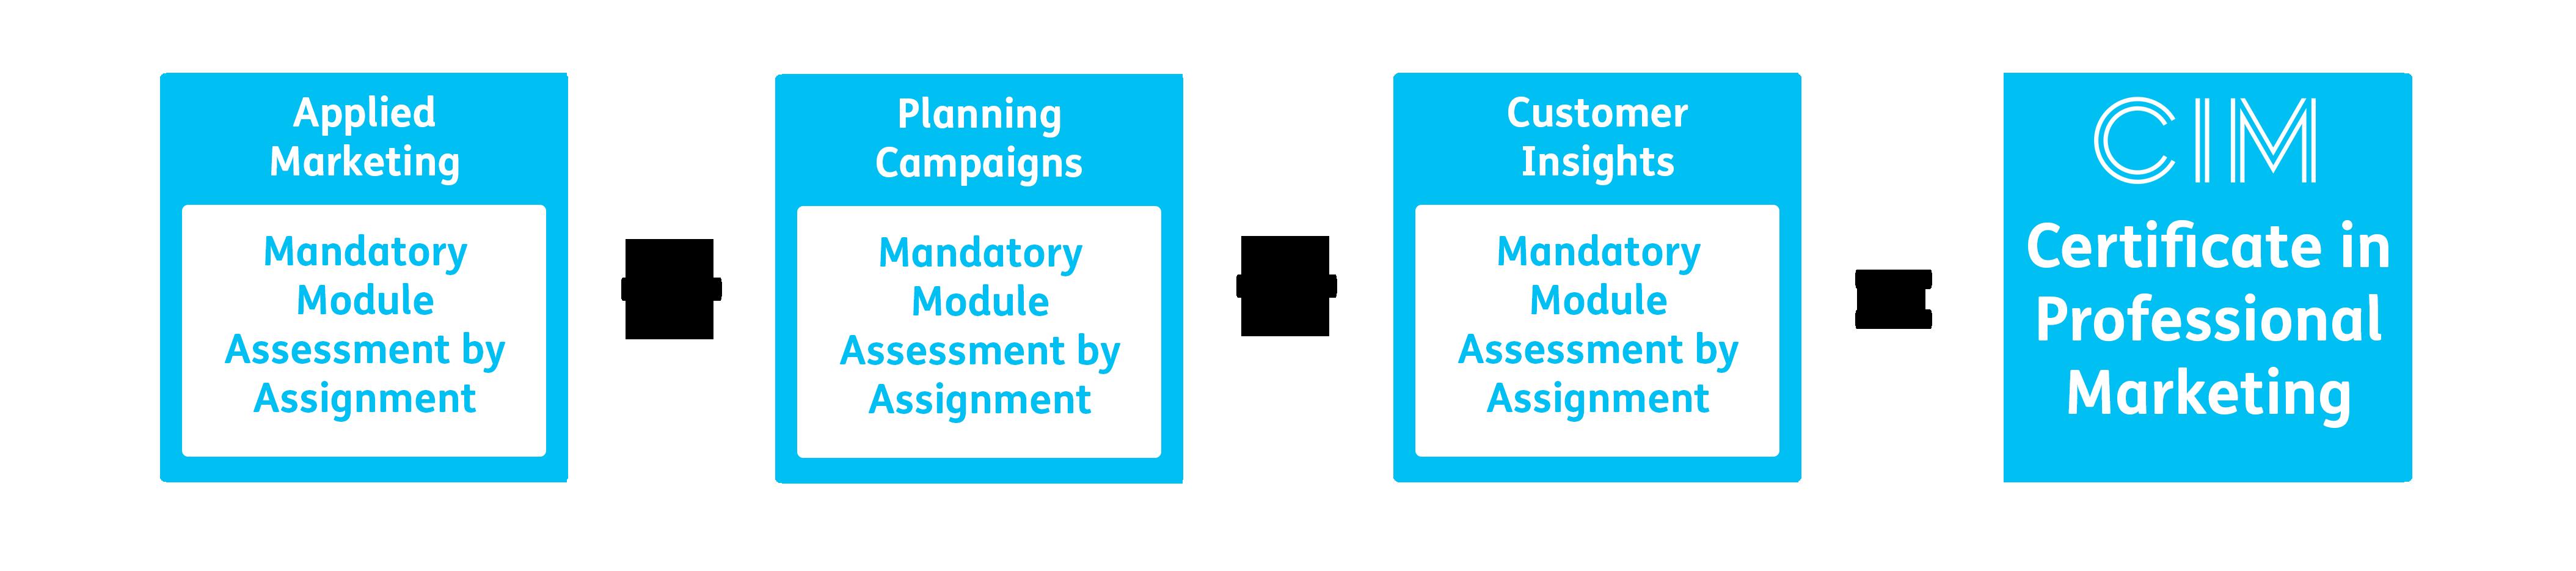 cim-certificate-in-professional-marketing-level-4.png